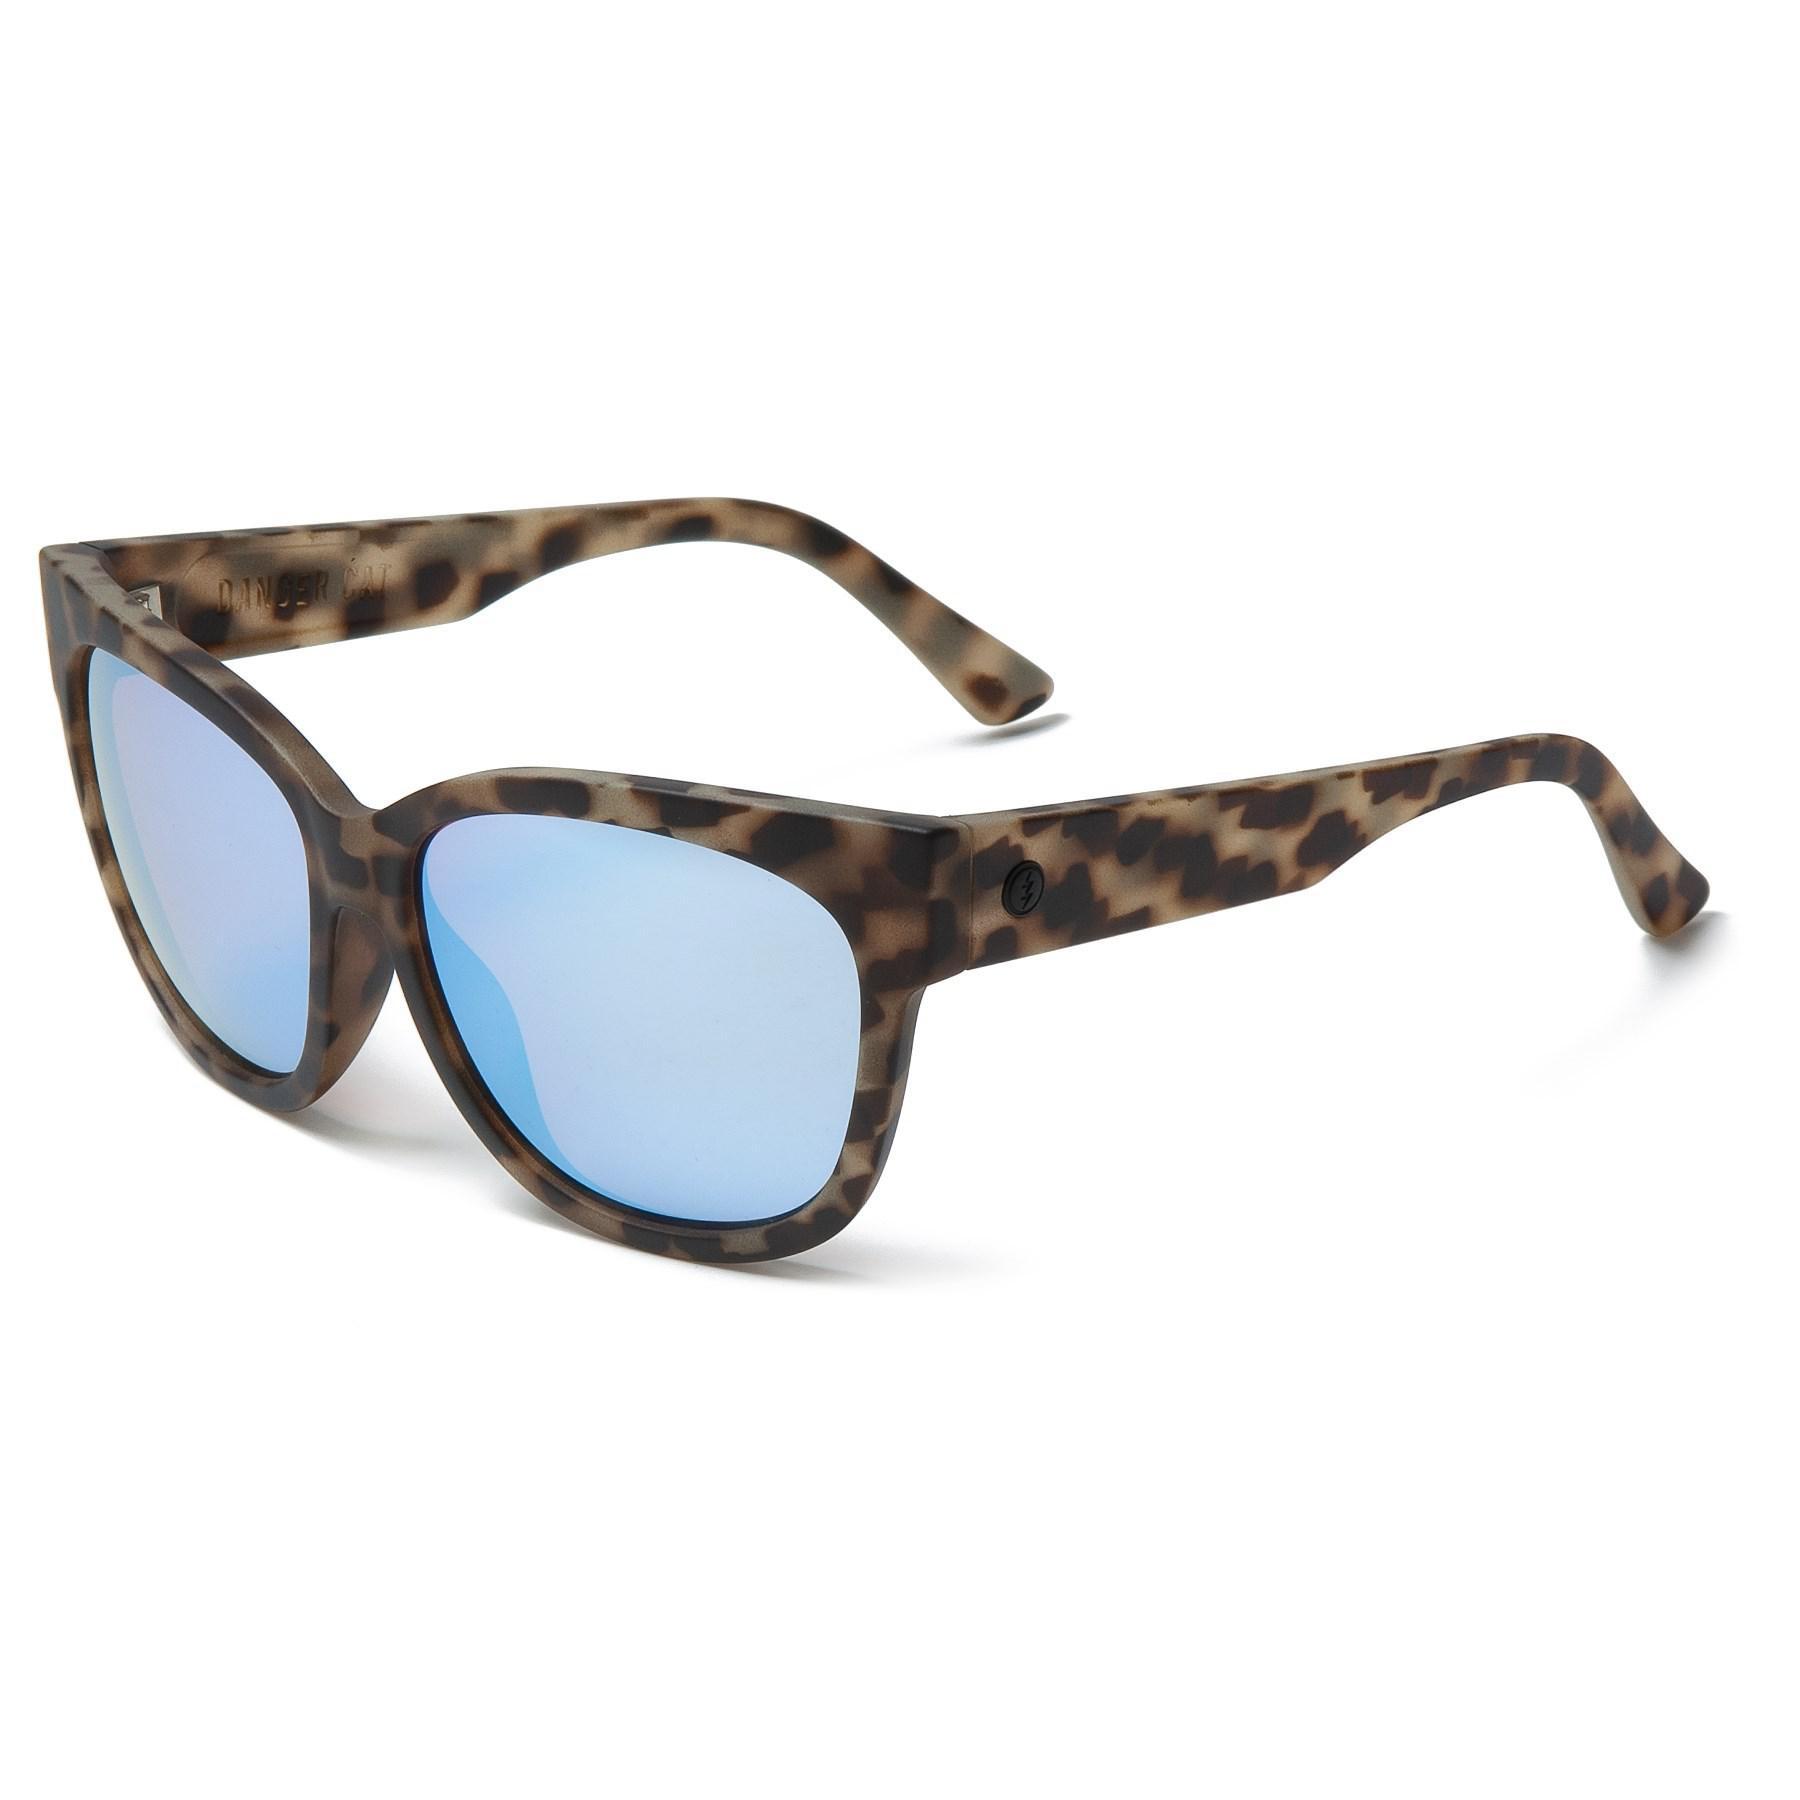 b1d2e990648 Lyst - Electric Danger Cat Ohm Lens Sunglasses (for Women) in Blue